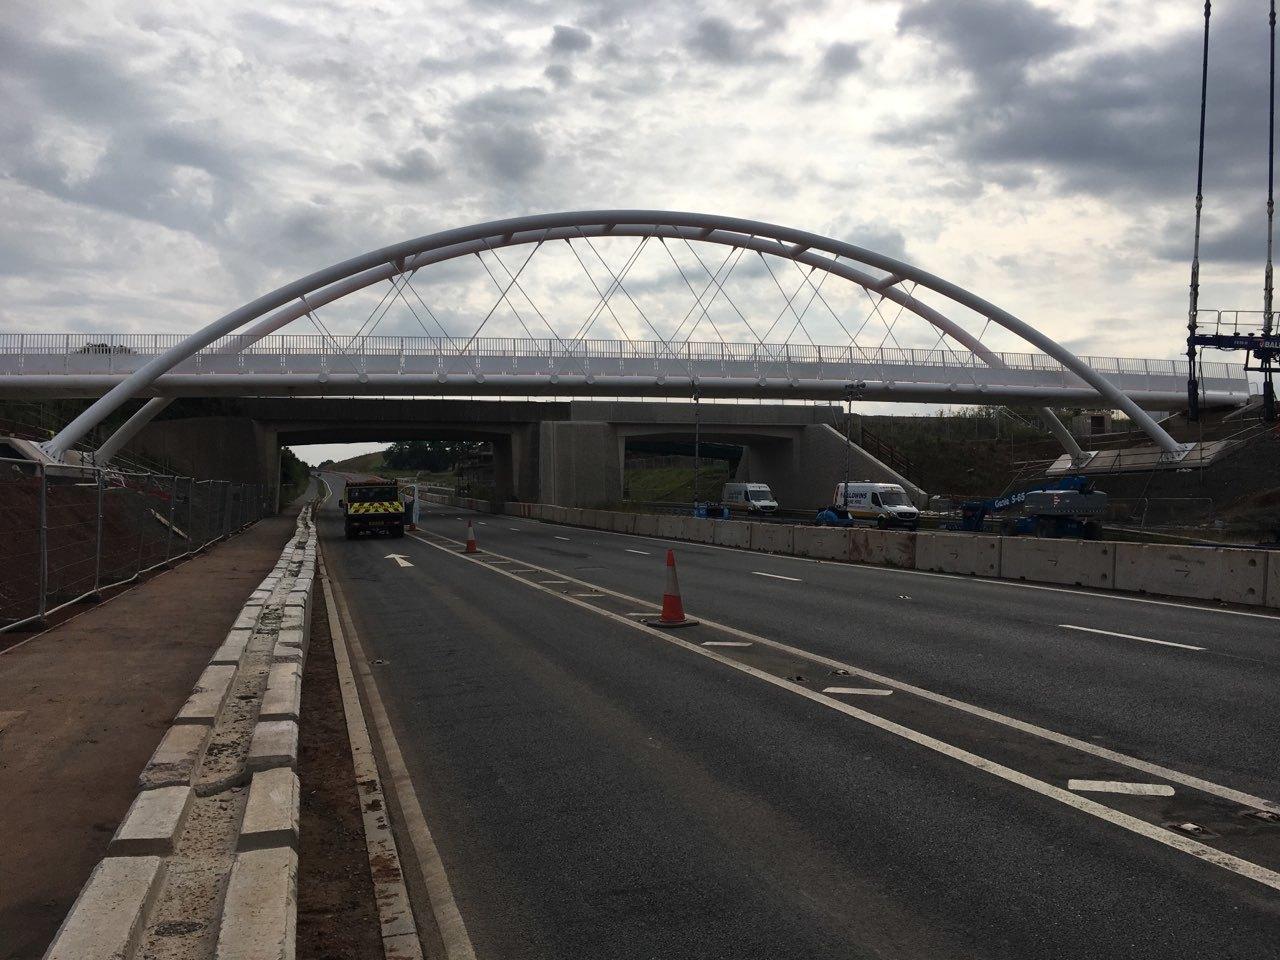 GREEN MATTERS: A4440 Crookbarrow Way bridge can help build cycle use